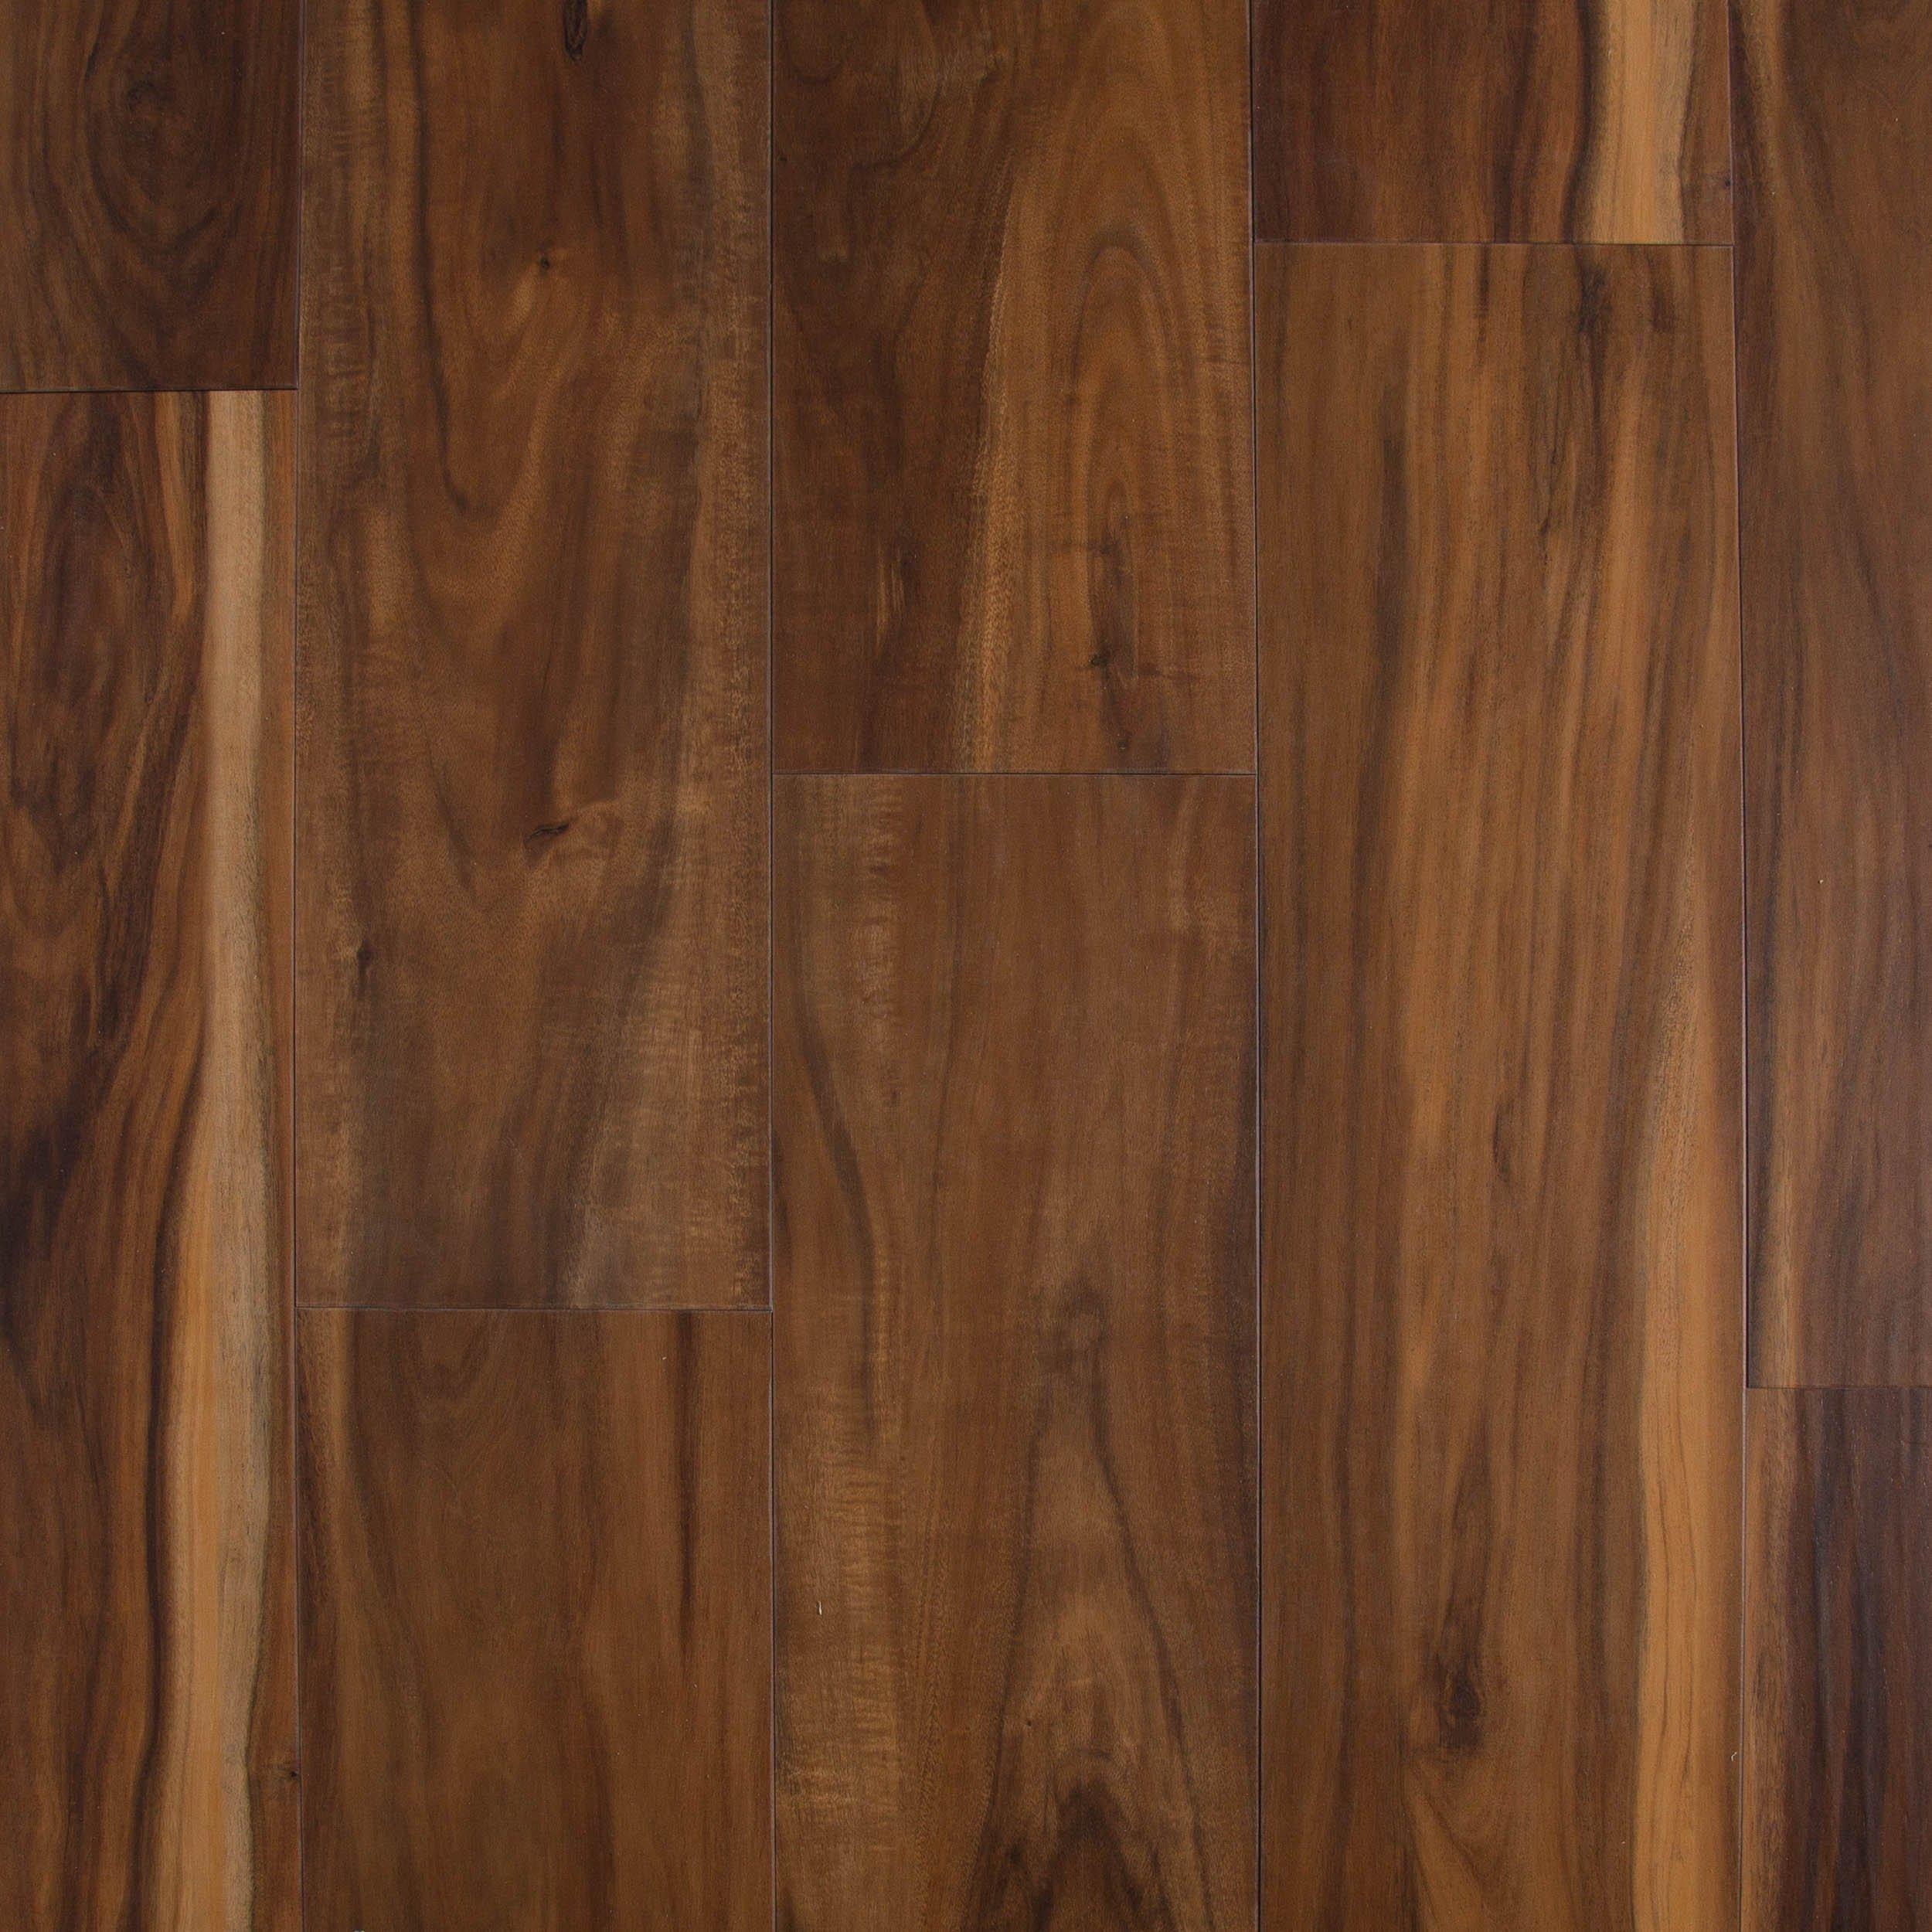 Acacia Rigid Core Luxury Vinyl Plank Cork Back Luxury